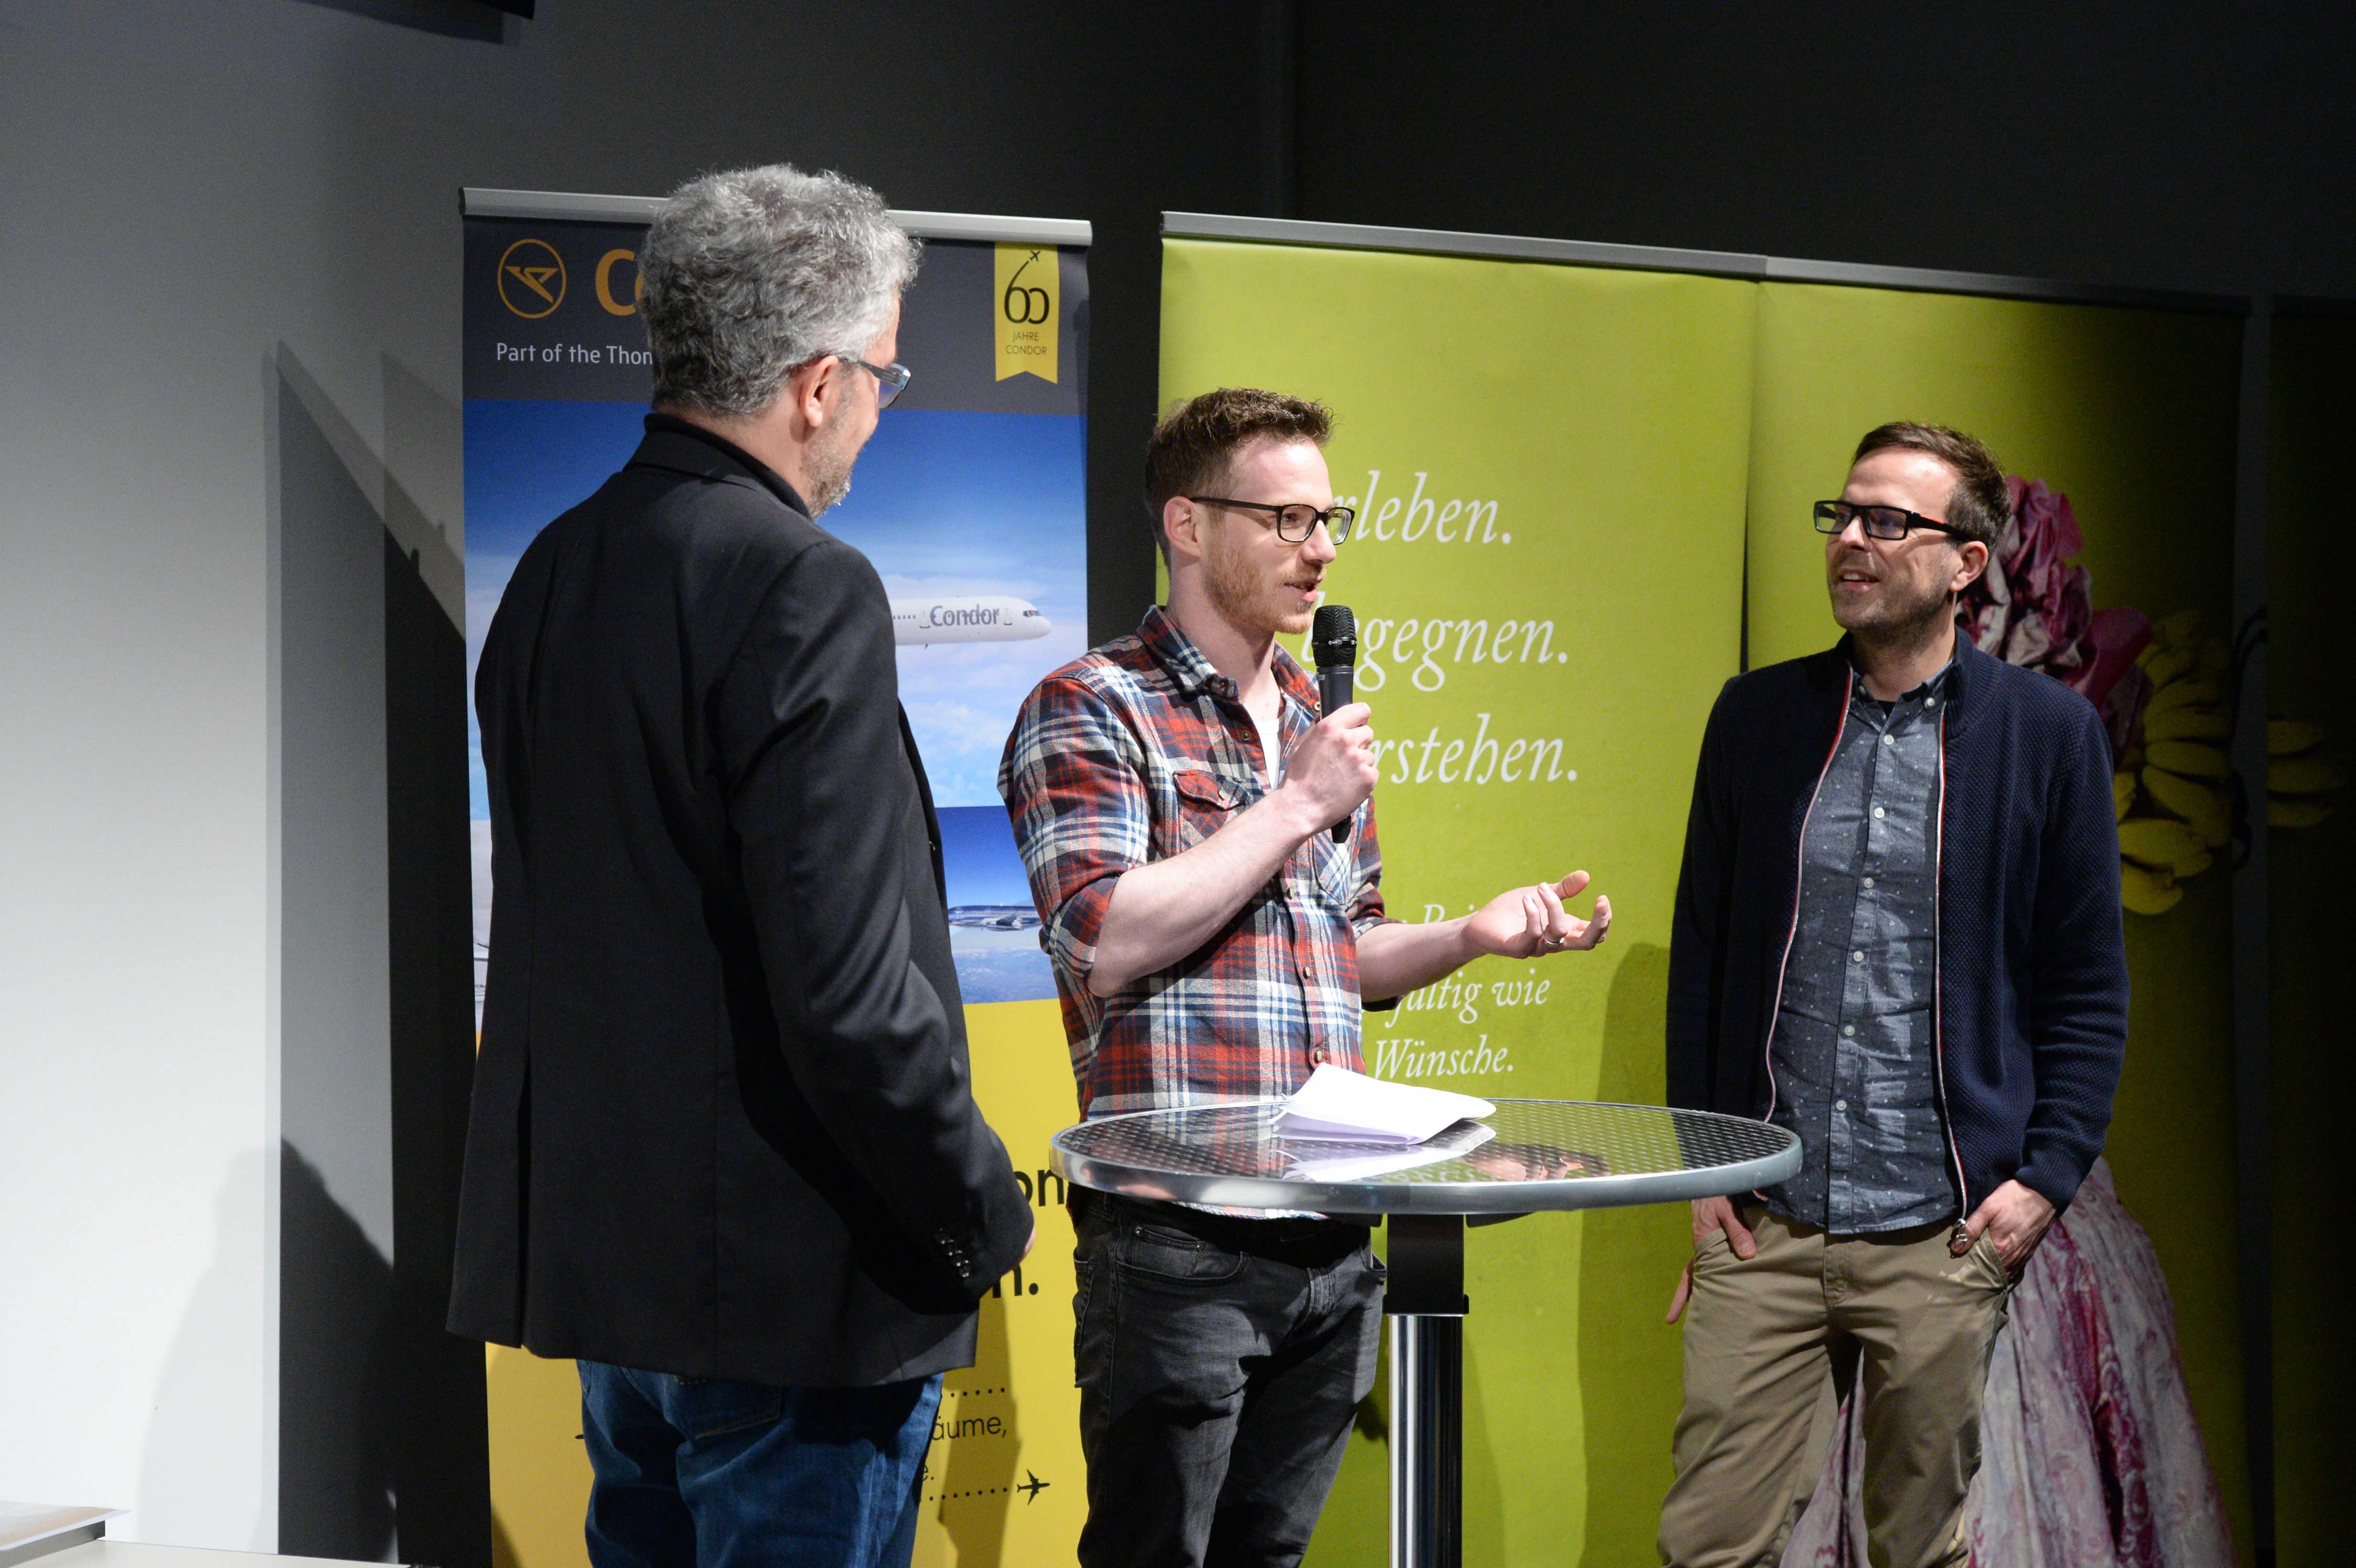 Columbus Film Preisverleihung 2015 Christoph Karrasch und Thomas Niemann Talk mit Thomas Radler web